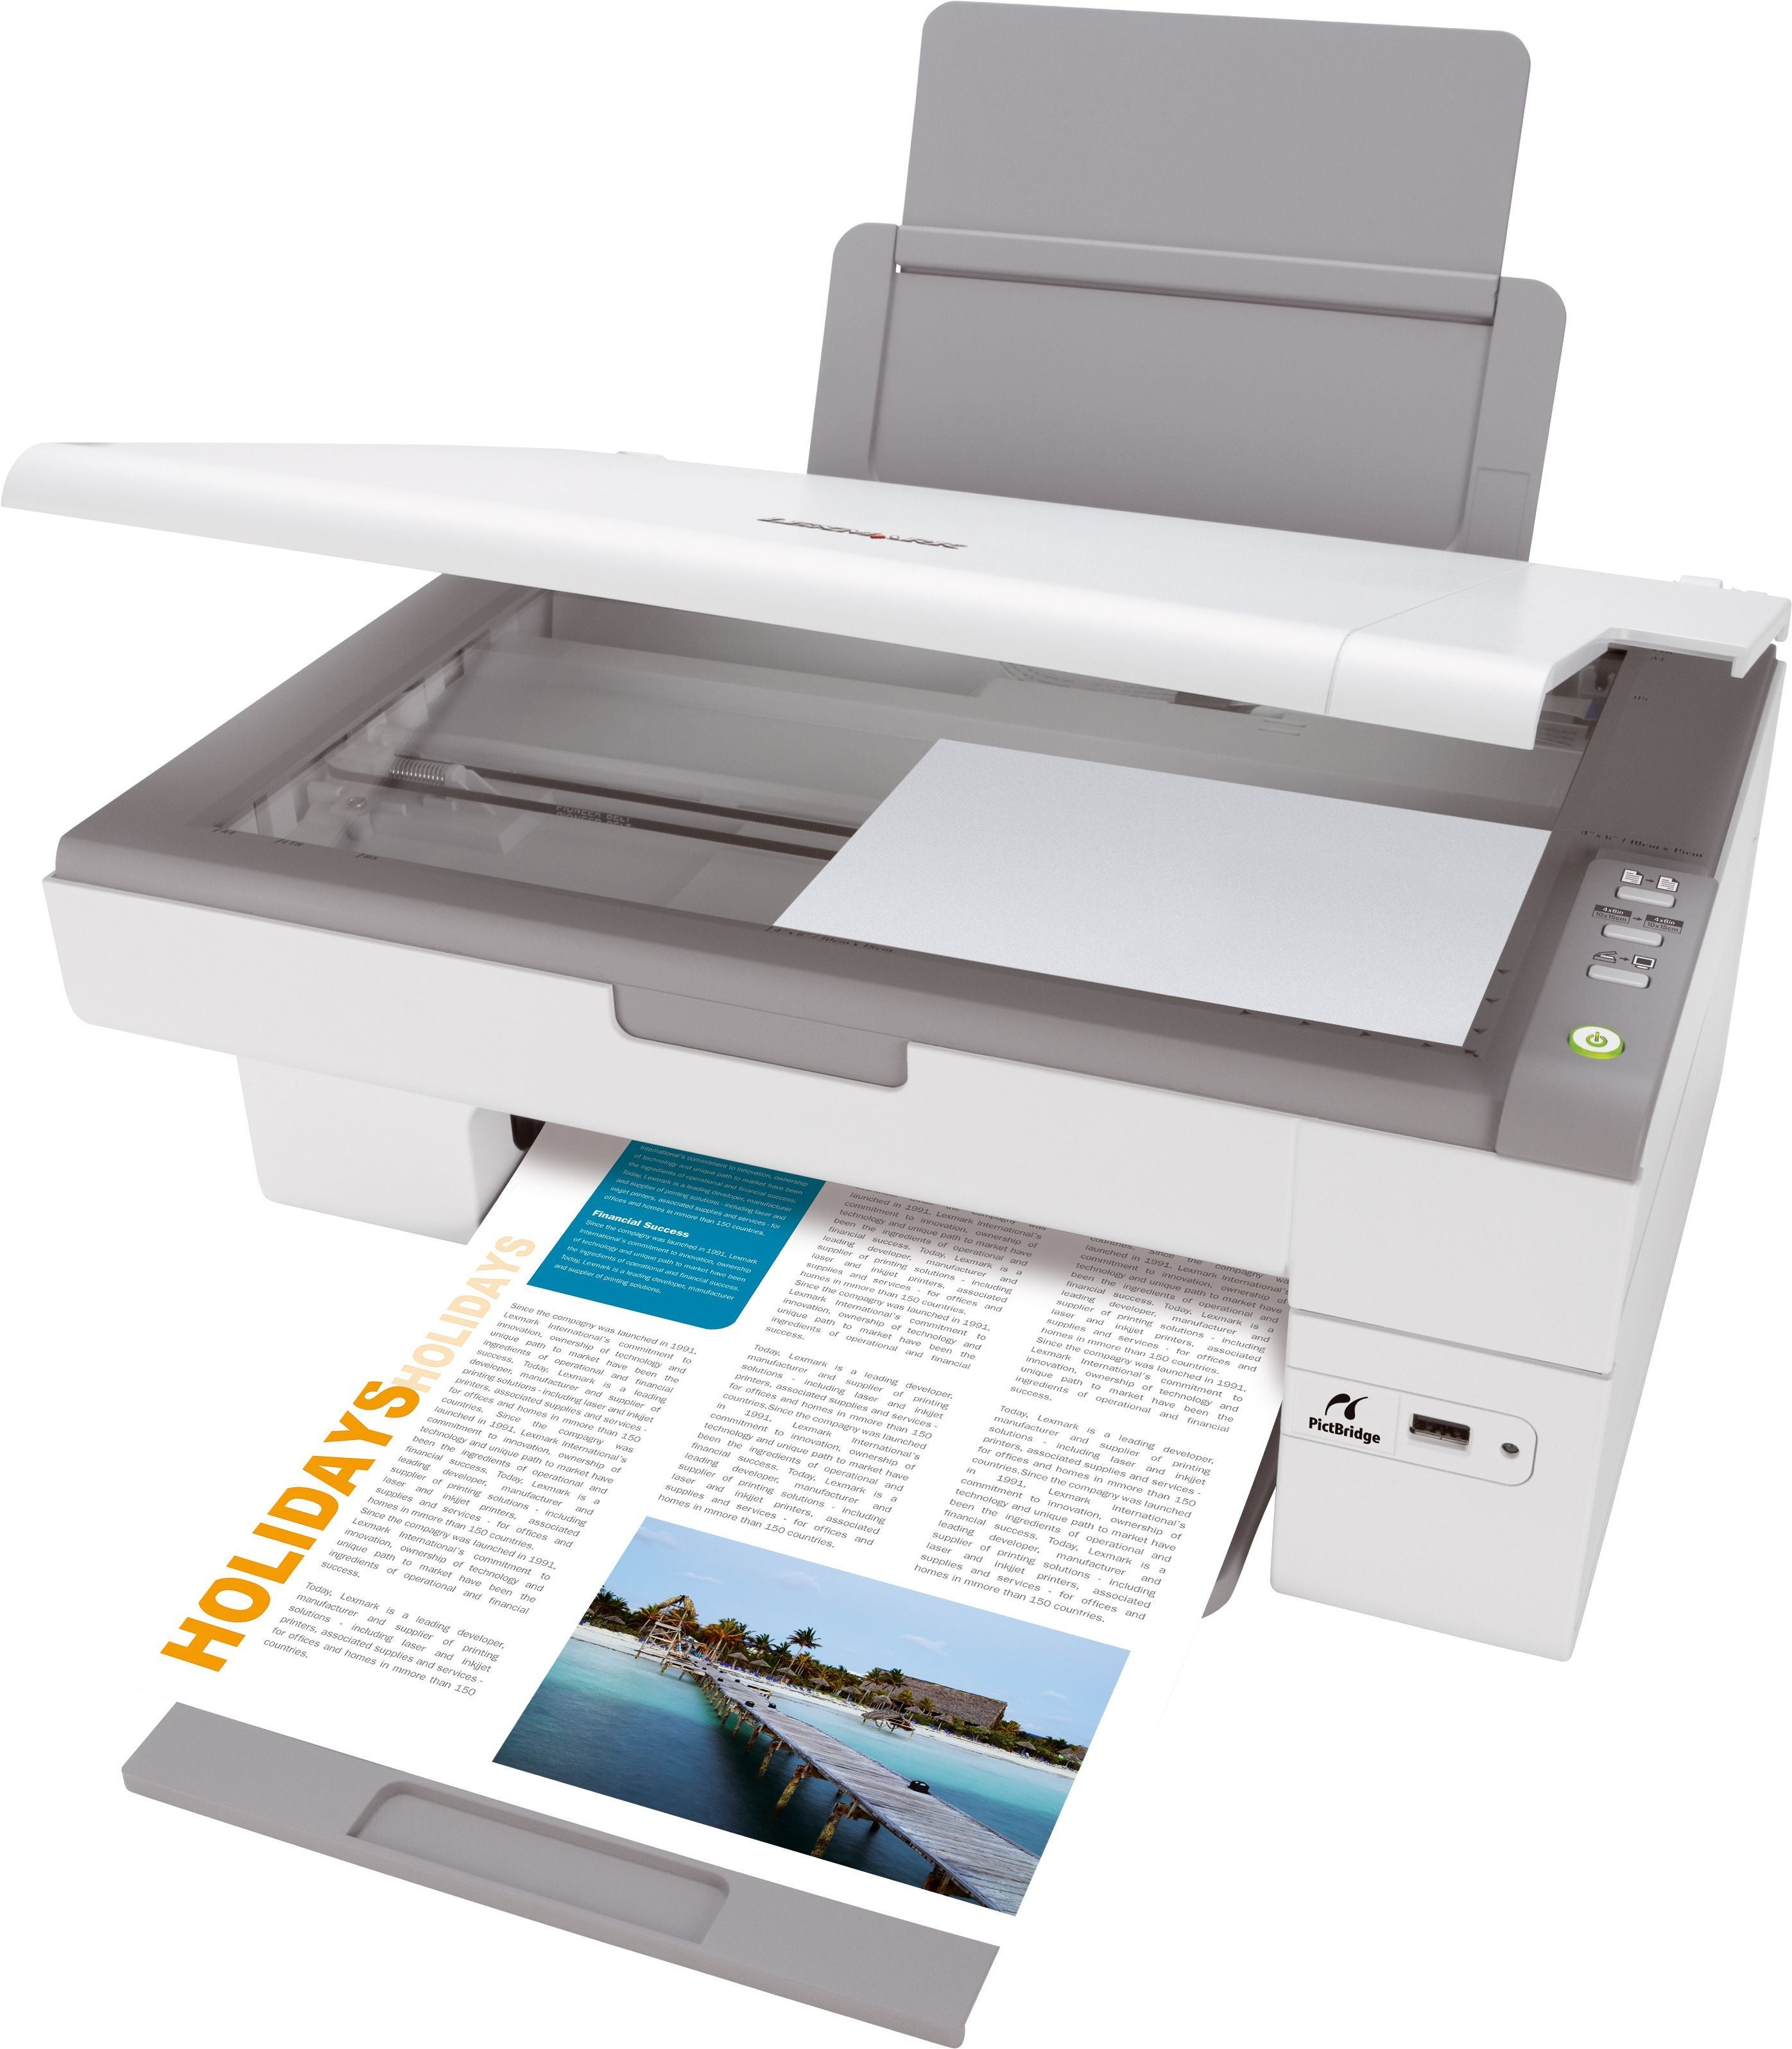 Lexmark Printer Drivers Update For Windows 10